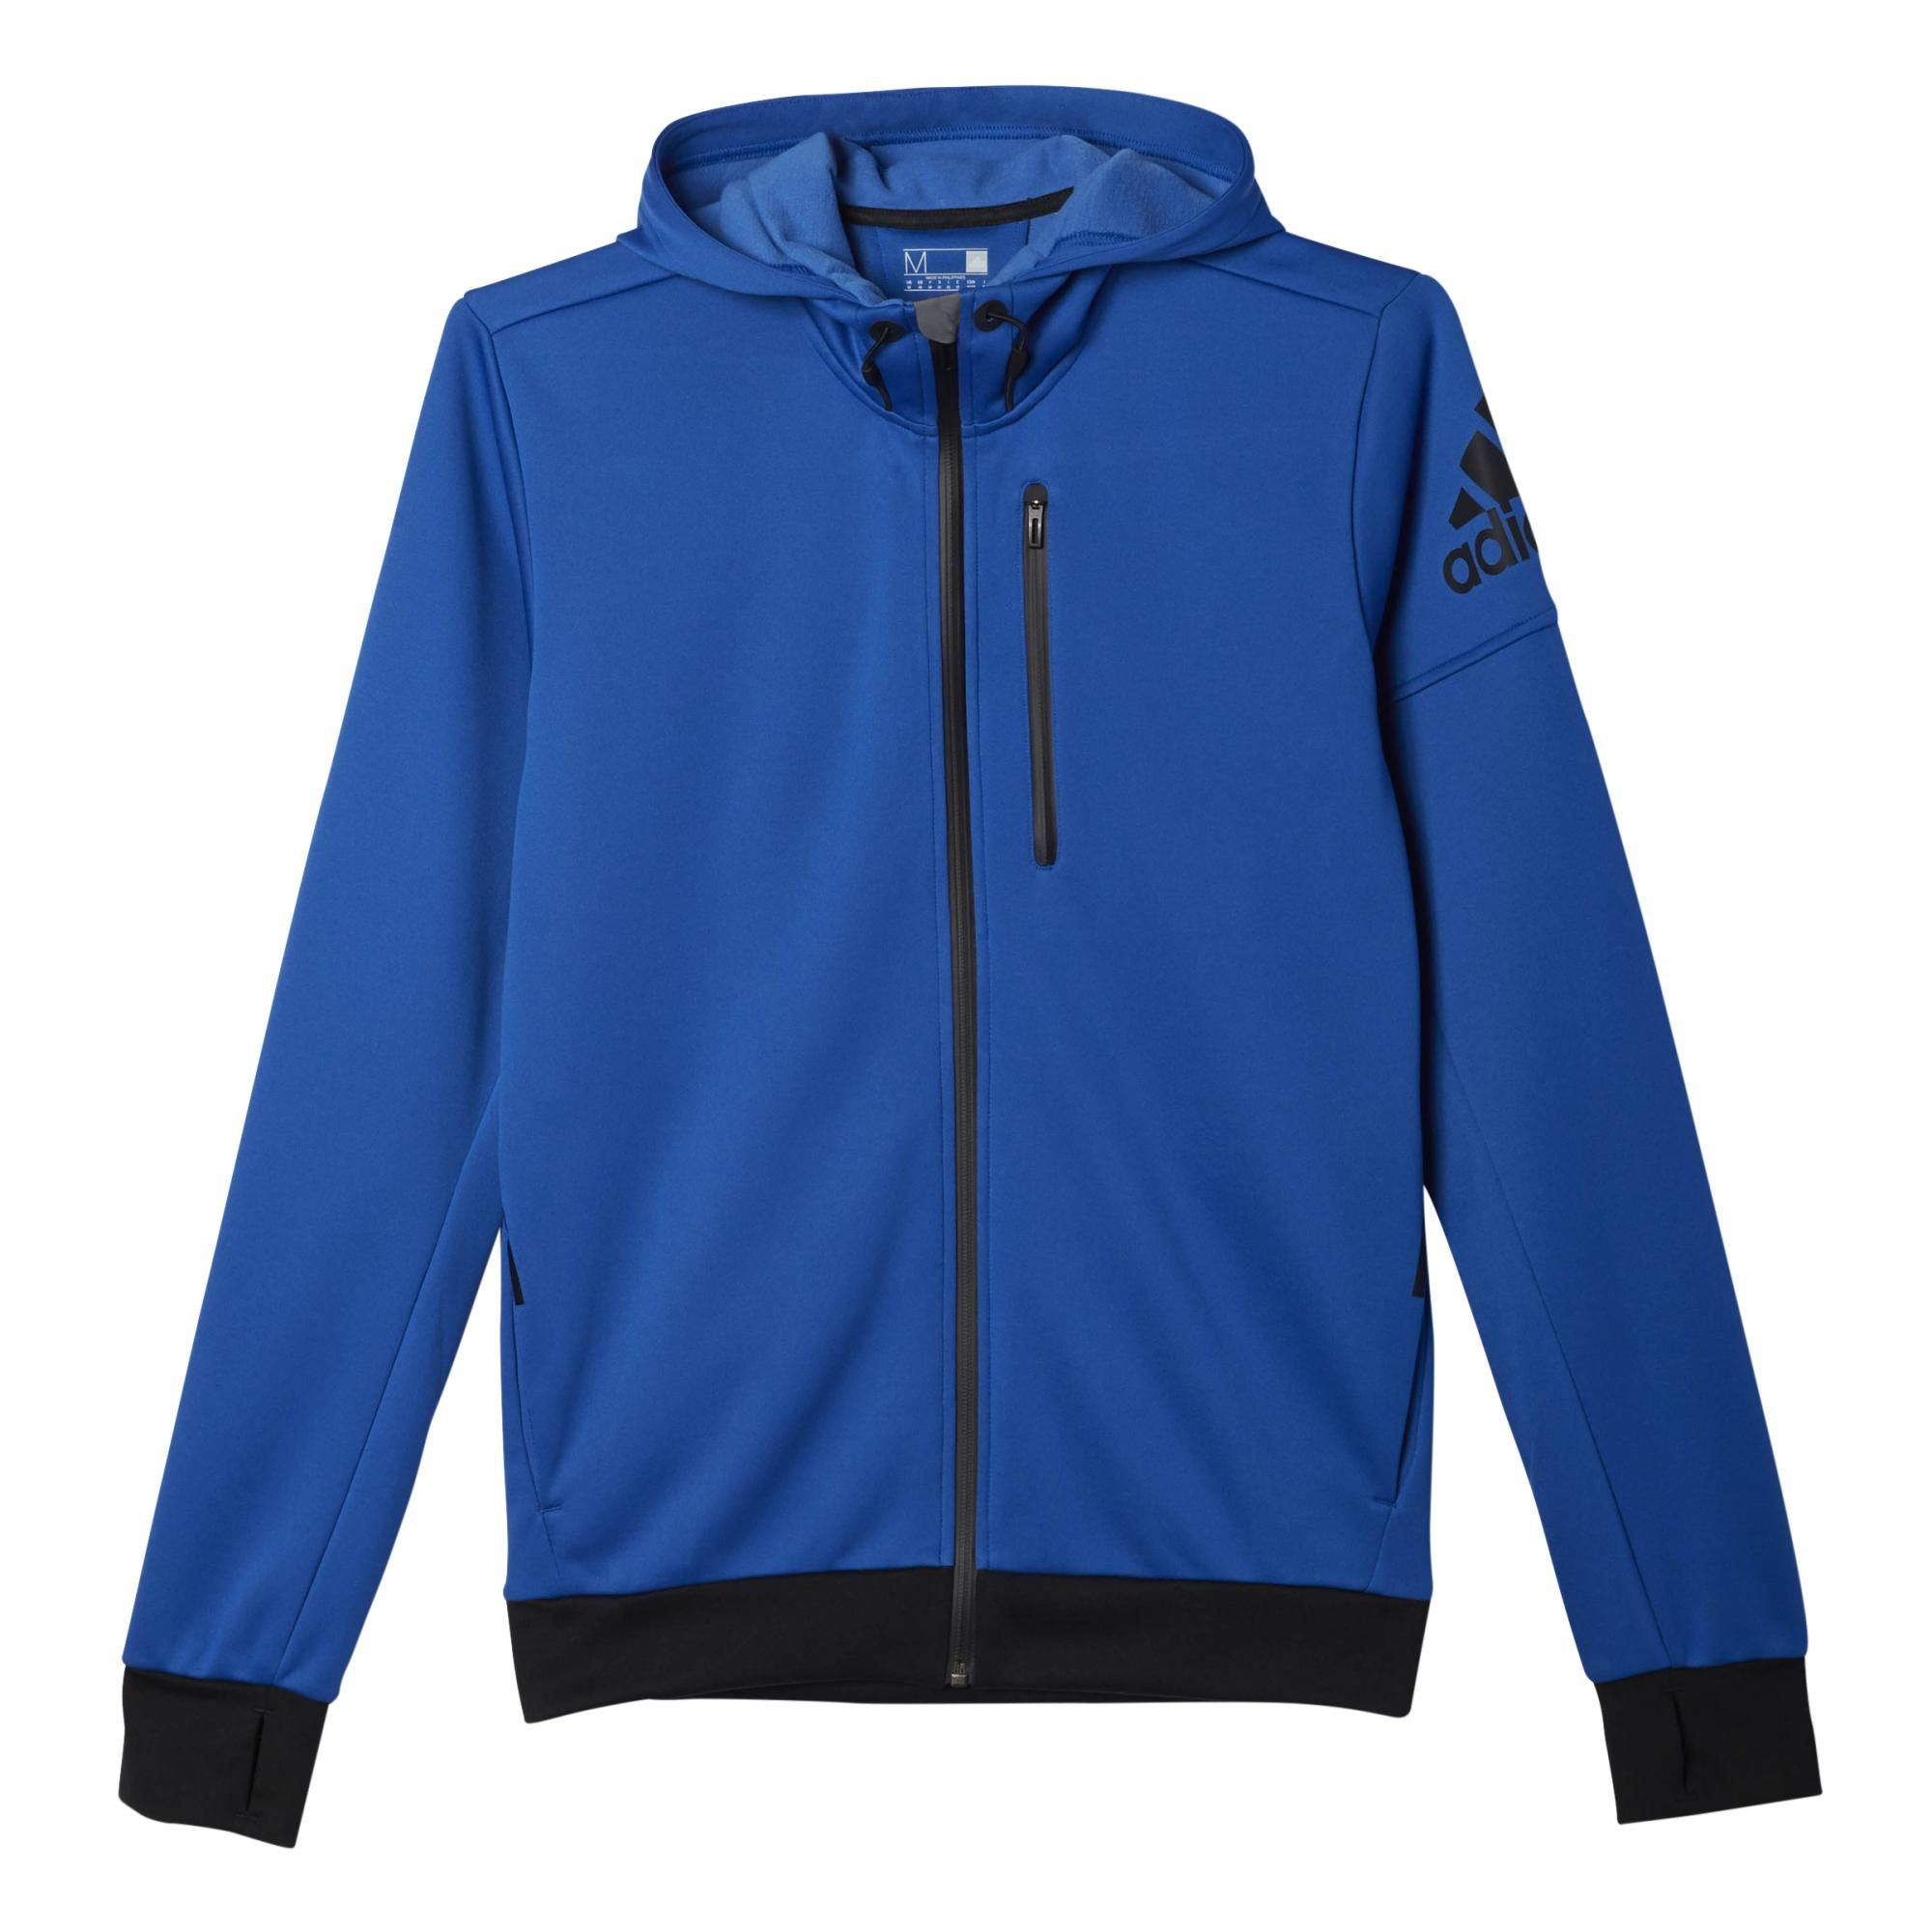 Hauts Adidas Bleu Homme Veste Capuche Daybreaker France